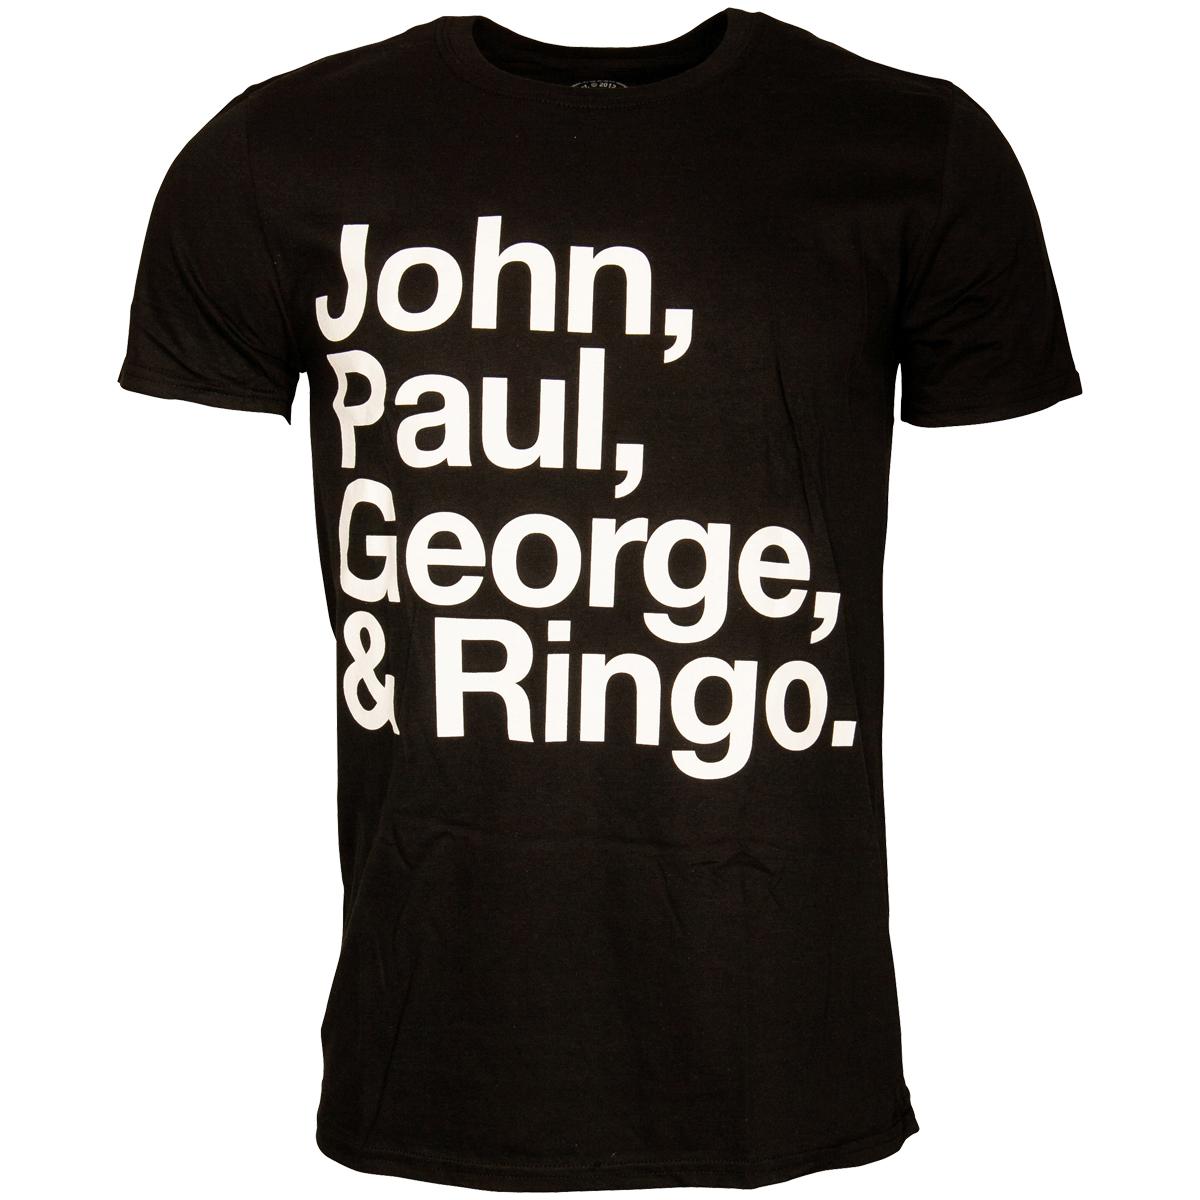 The Beatles - T-Shirt John Paul George & Ringo - schwarz